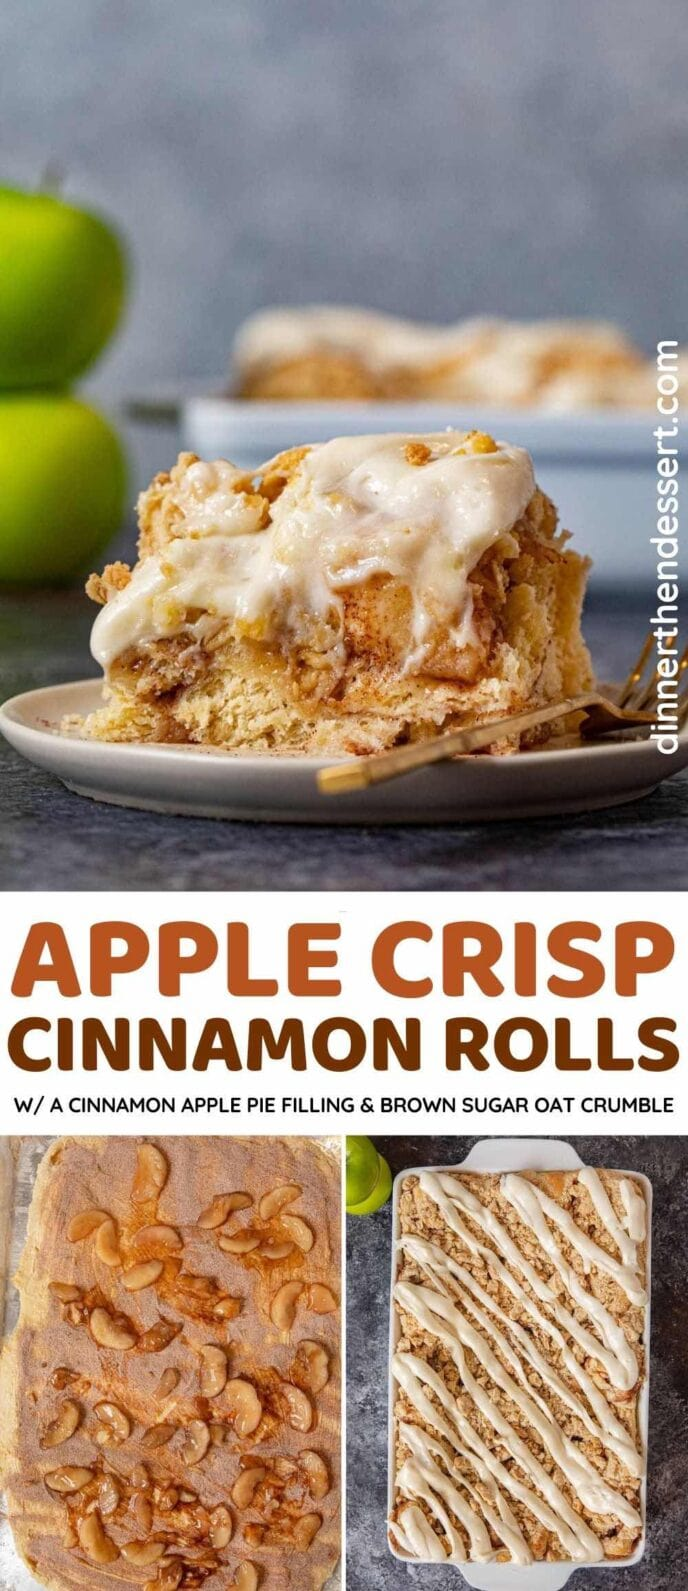 Apple Crisp Cinnamon Rolls collage